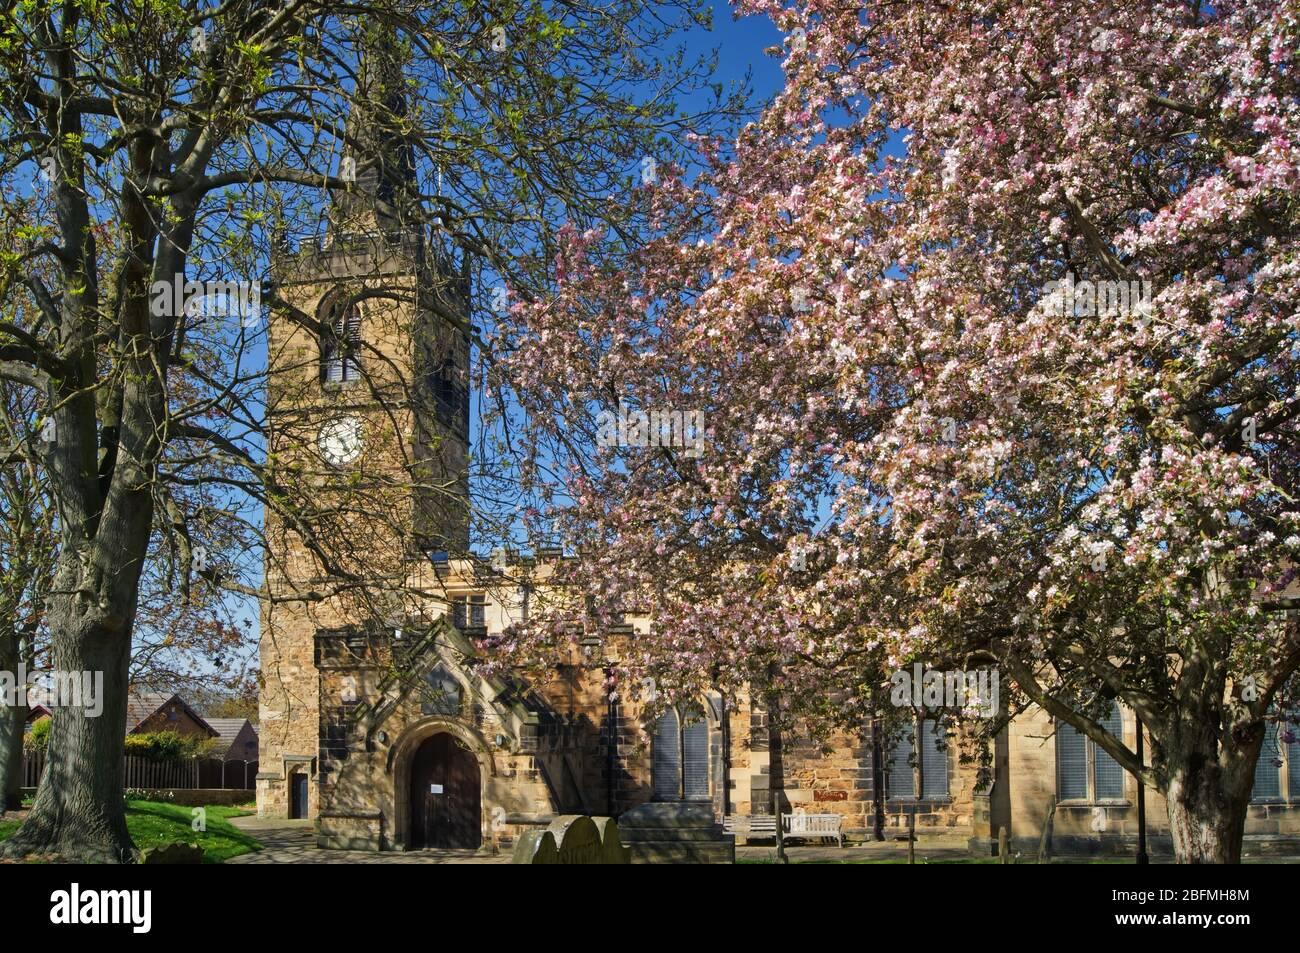 UK,South Yorkshire,Rotherham,Wath Upon Dearne,All Saints Church Stock Photo